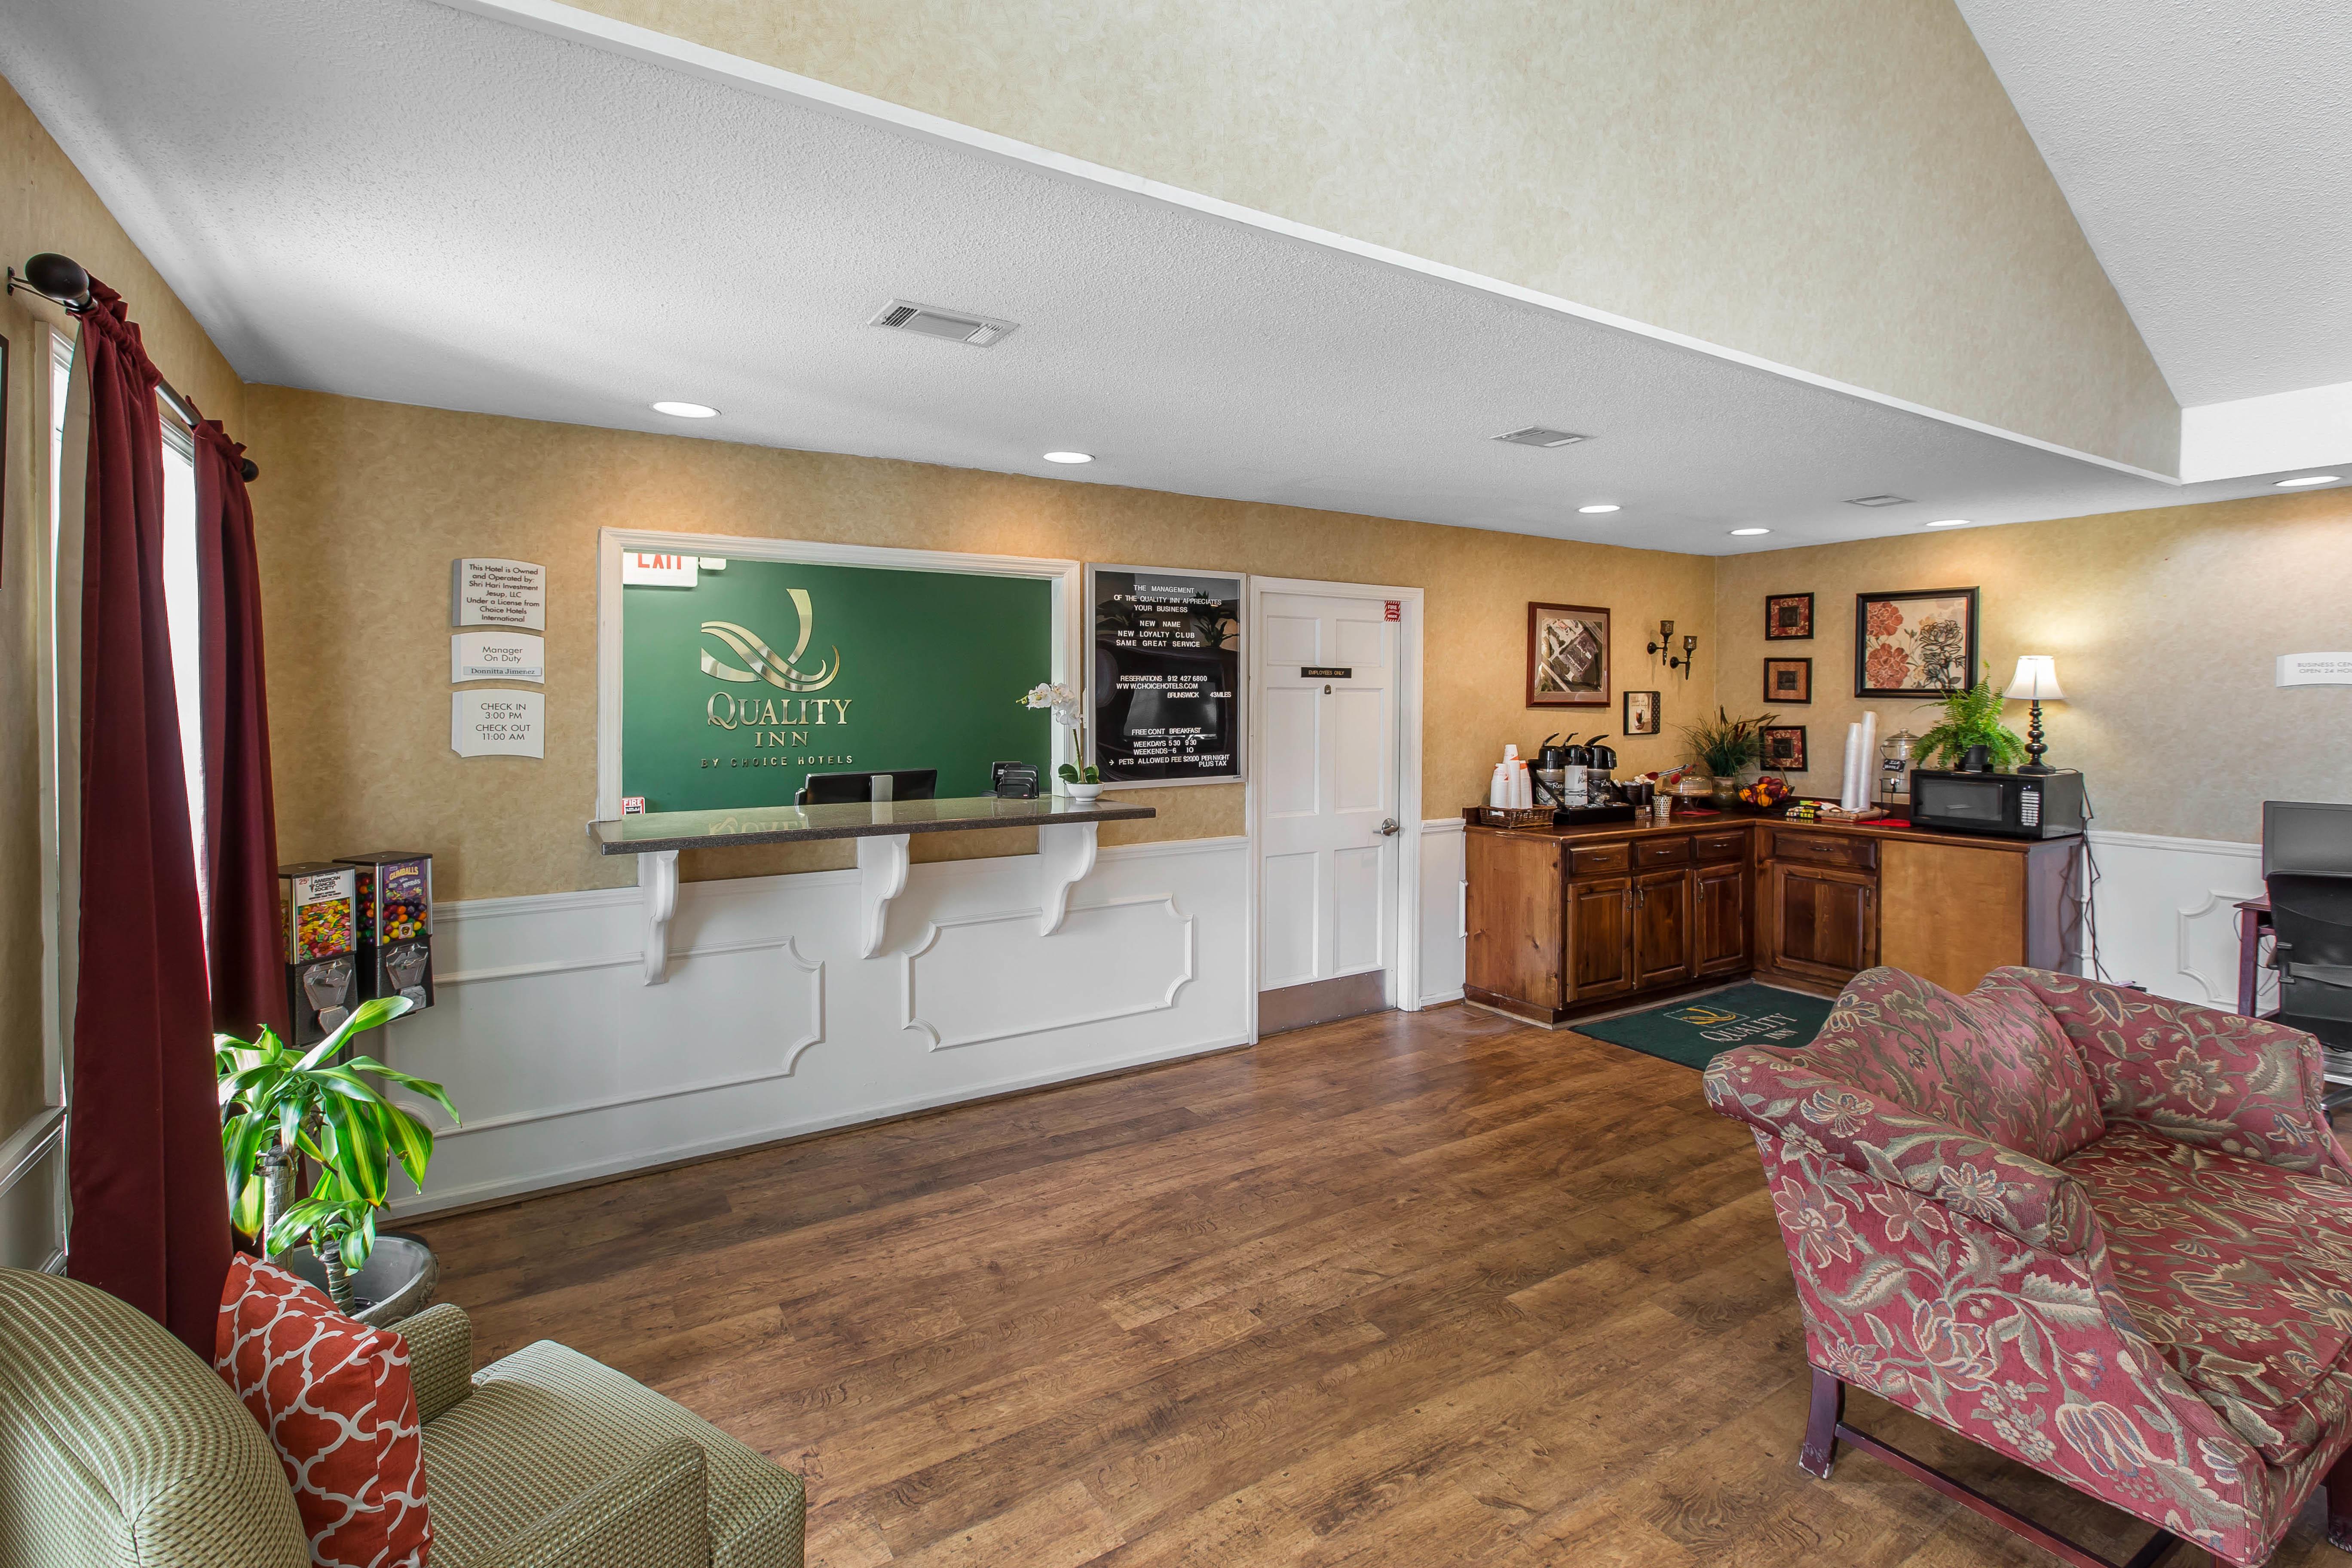 quality inn in jesup ga whitepages. Black Bedroom Furniture Sets. Home Design Ideas